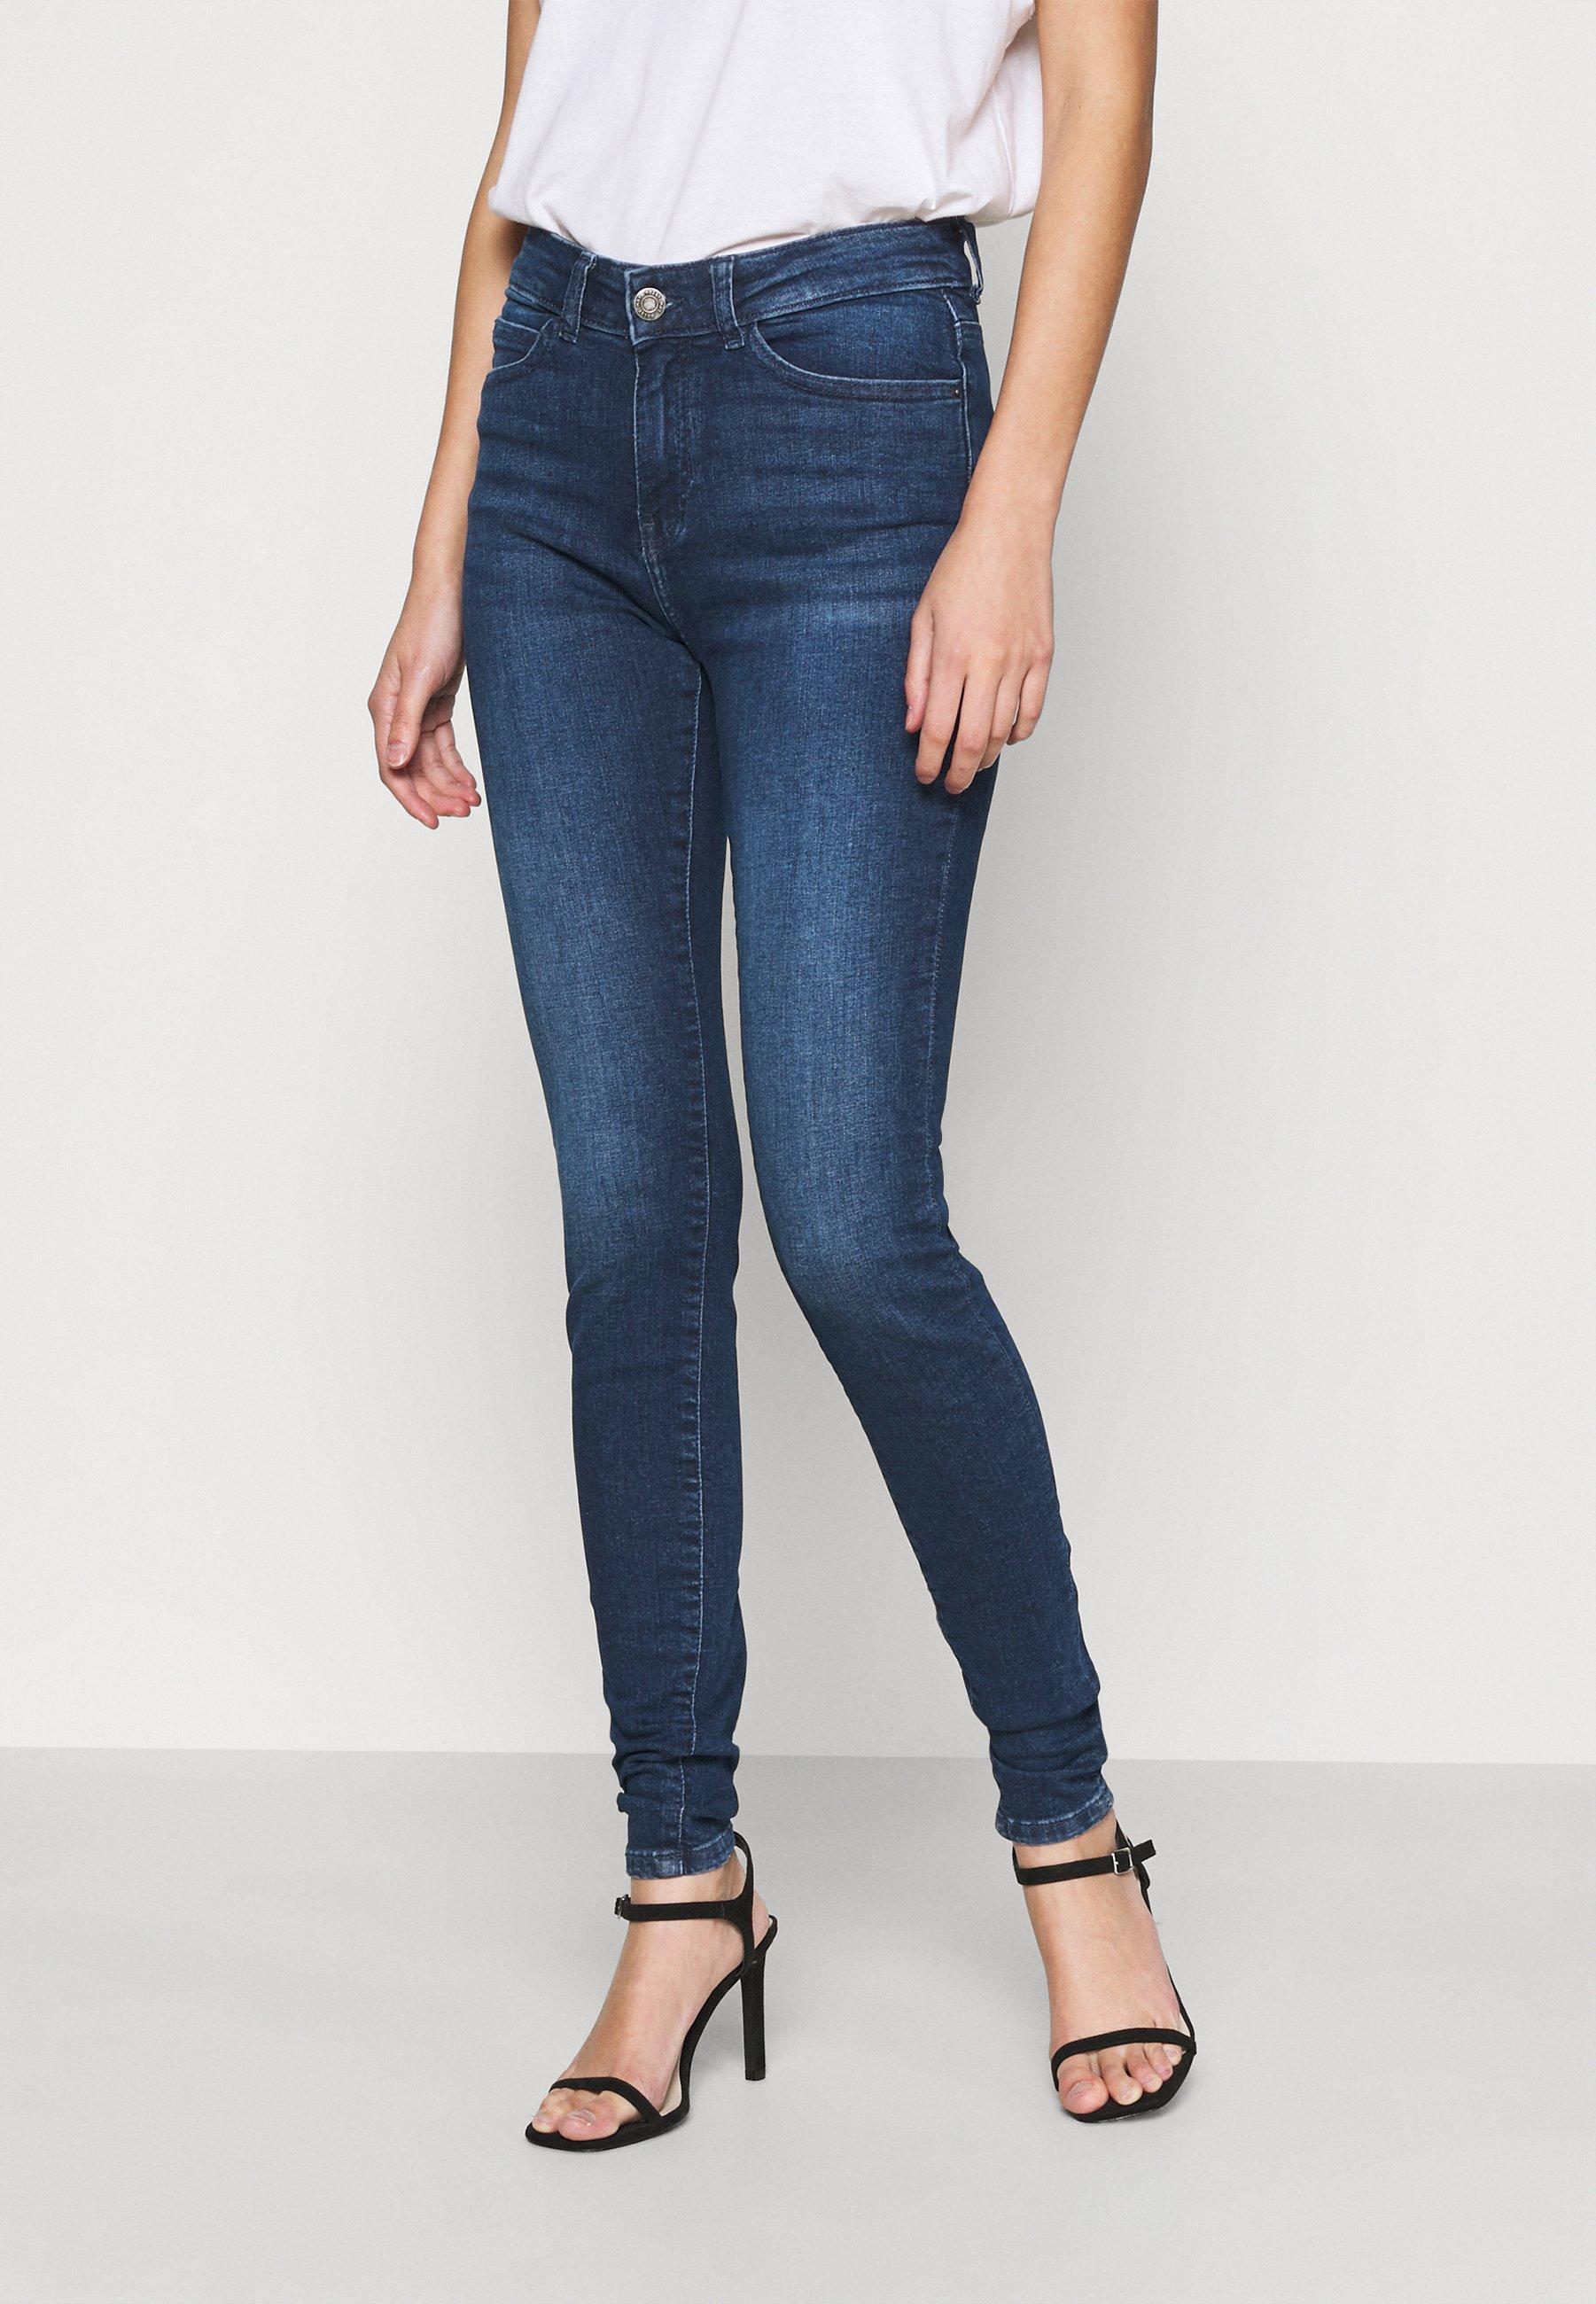 Women NMLUCY - Jeans Skinny Fit - dark blue